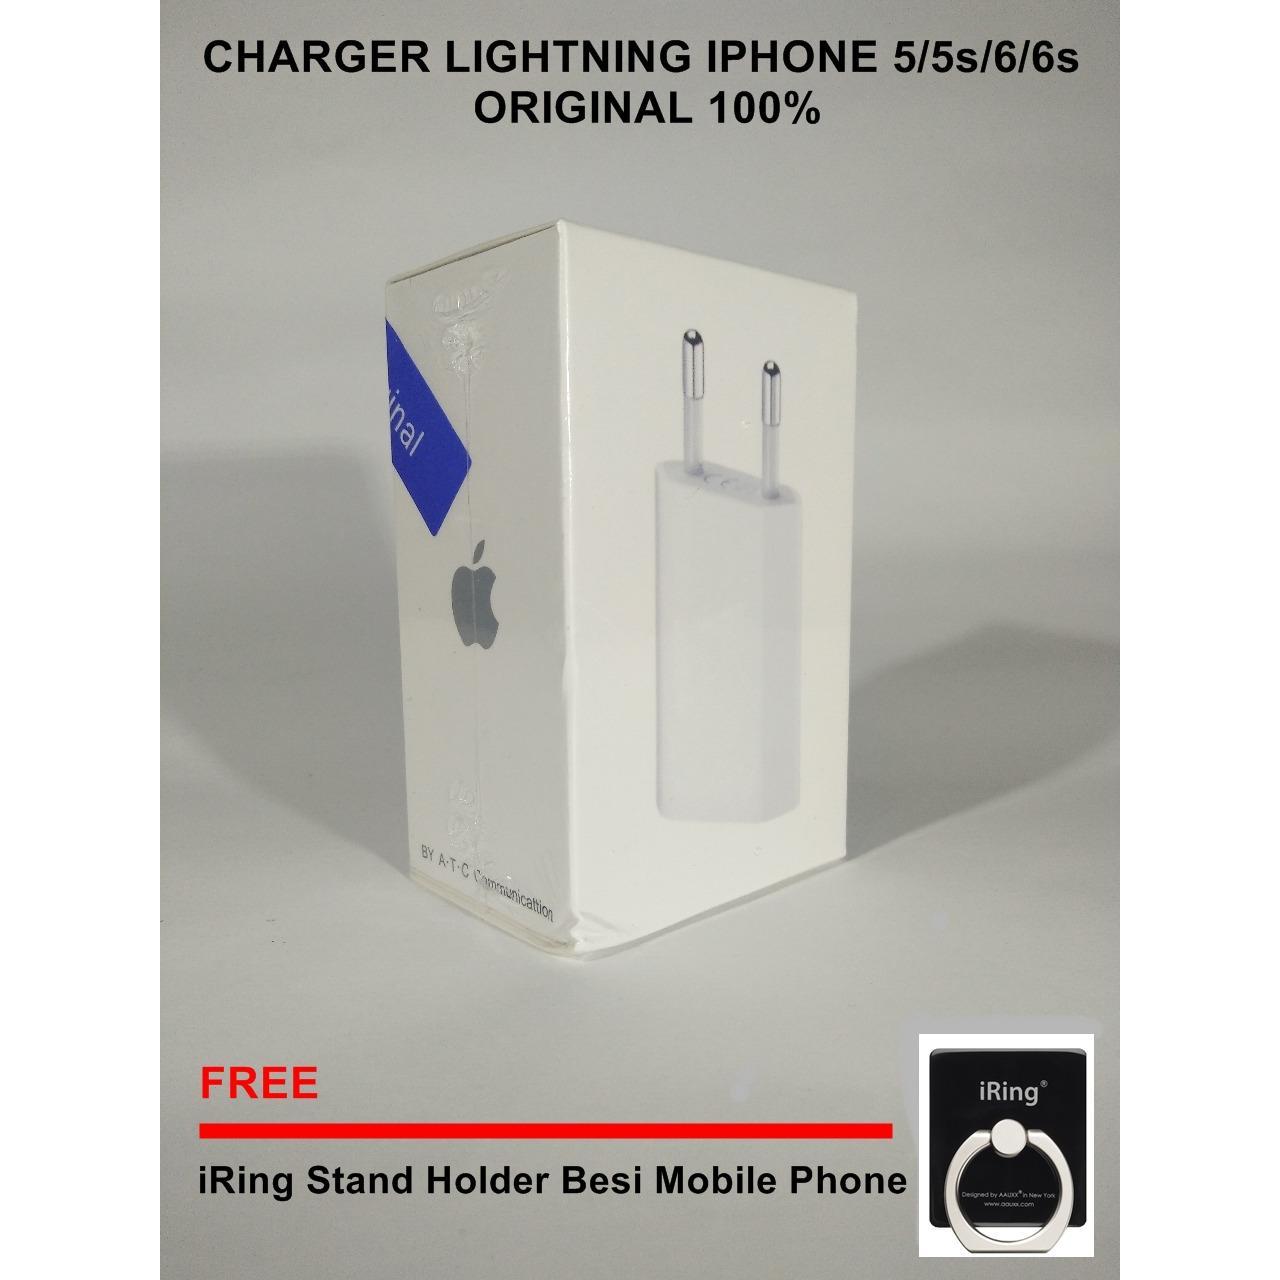 Harga Gold Store Charger Kabel Iphone 5 5S 6 6 Original Lightning Merk Apple